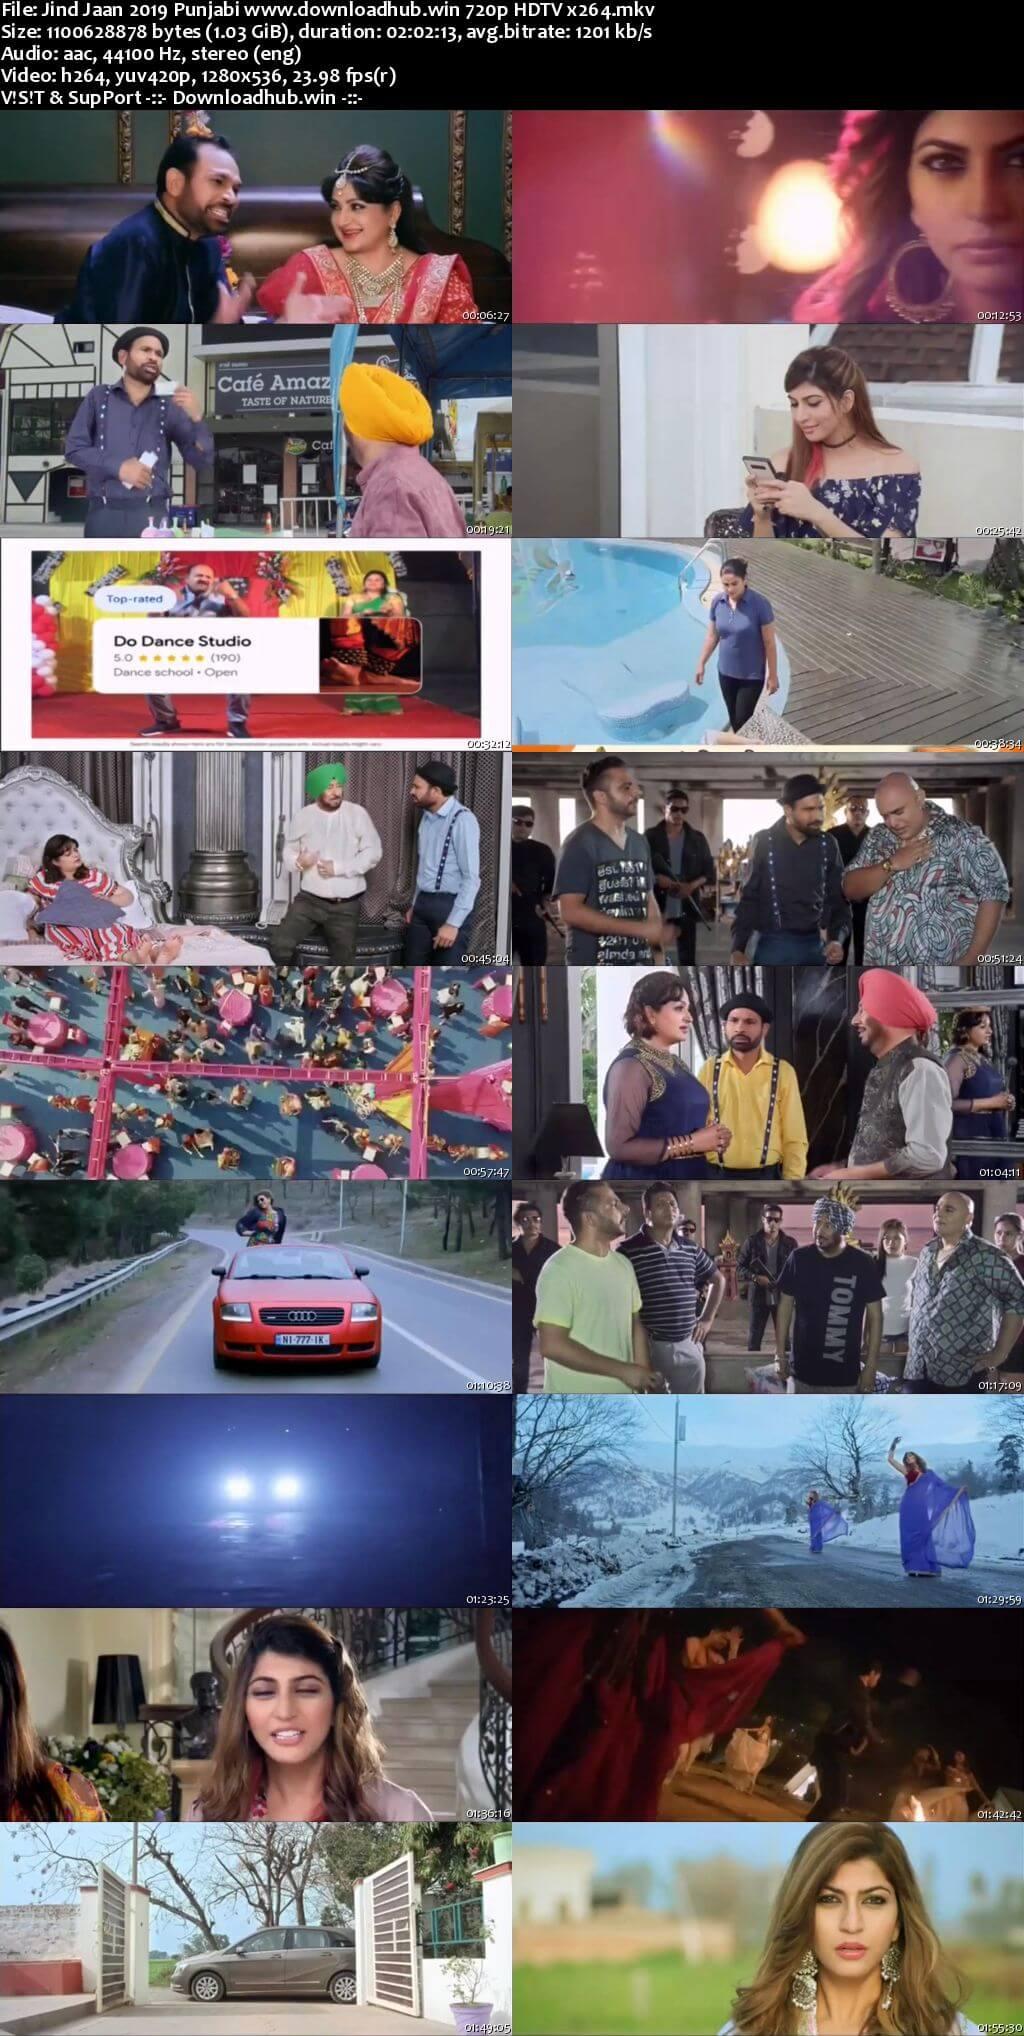 Jind Jaan 2019 Punjabi 720p HDTV x264